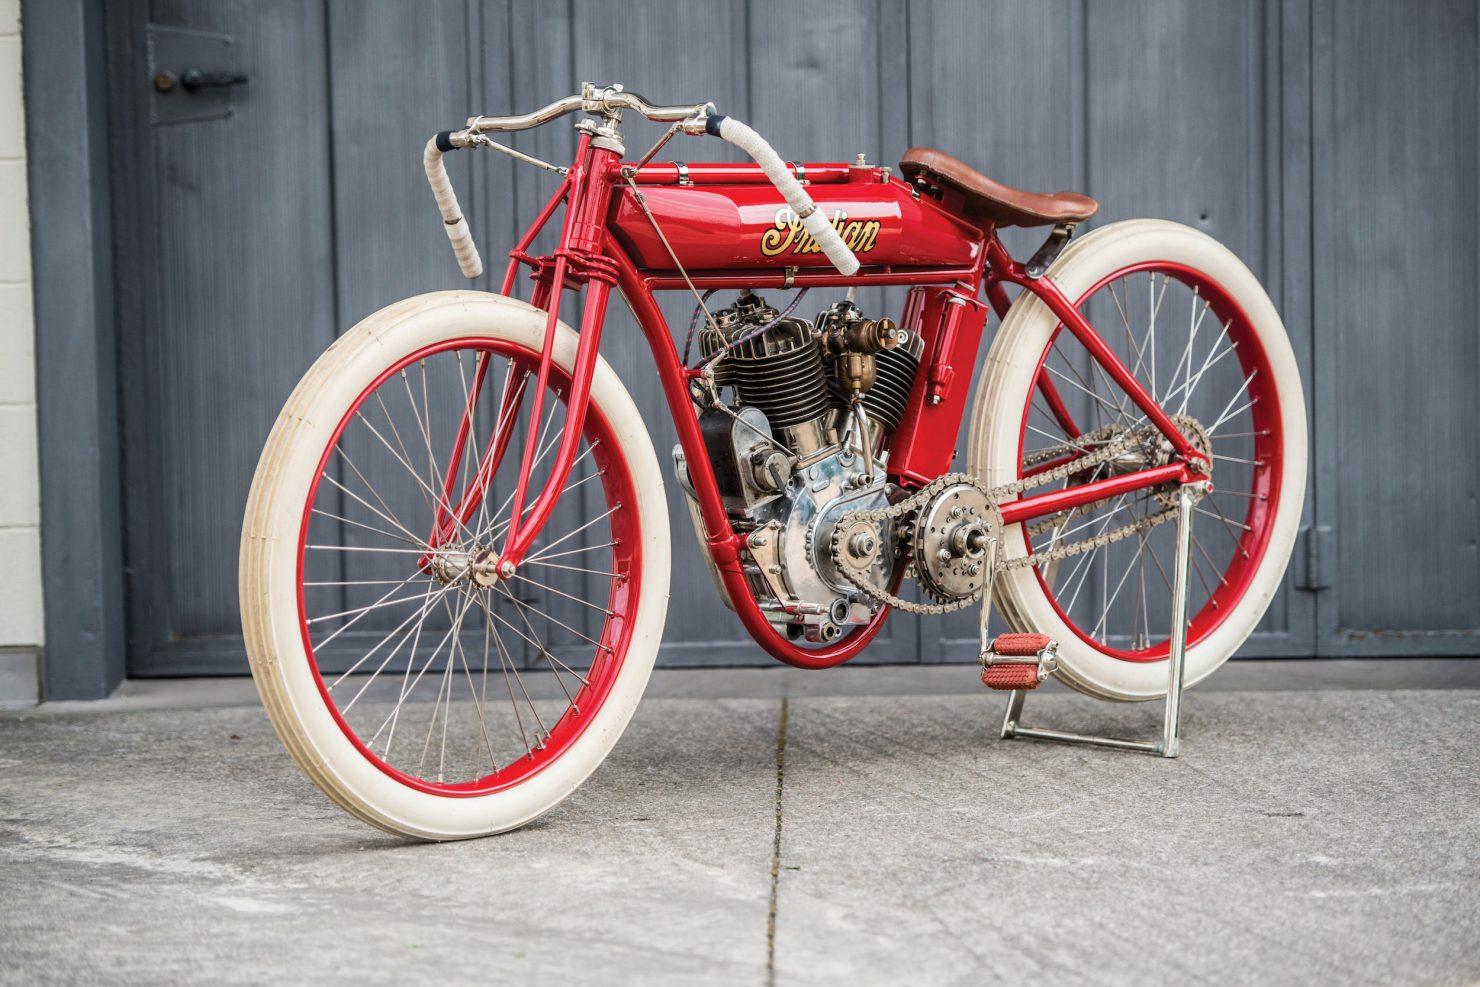 1921 harley davidson motorcycle racing board track racer. - eBay Board track racing photos